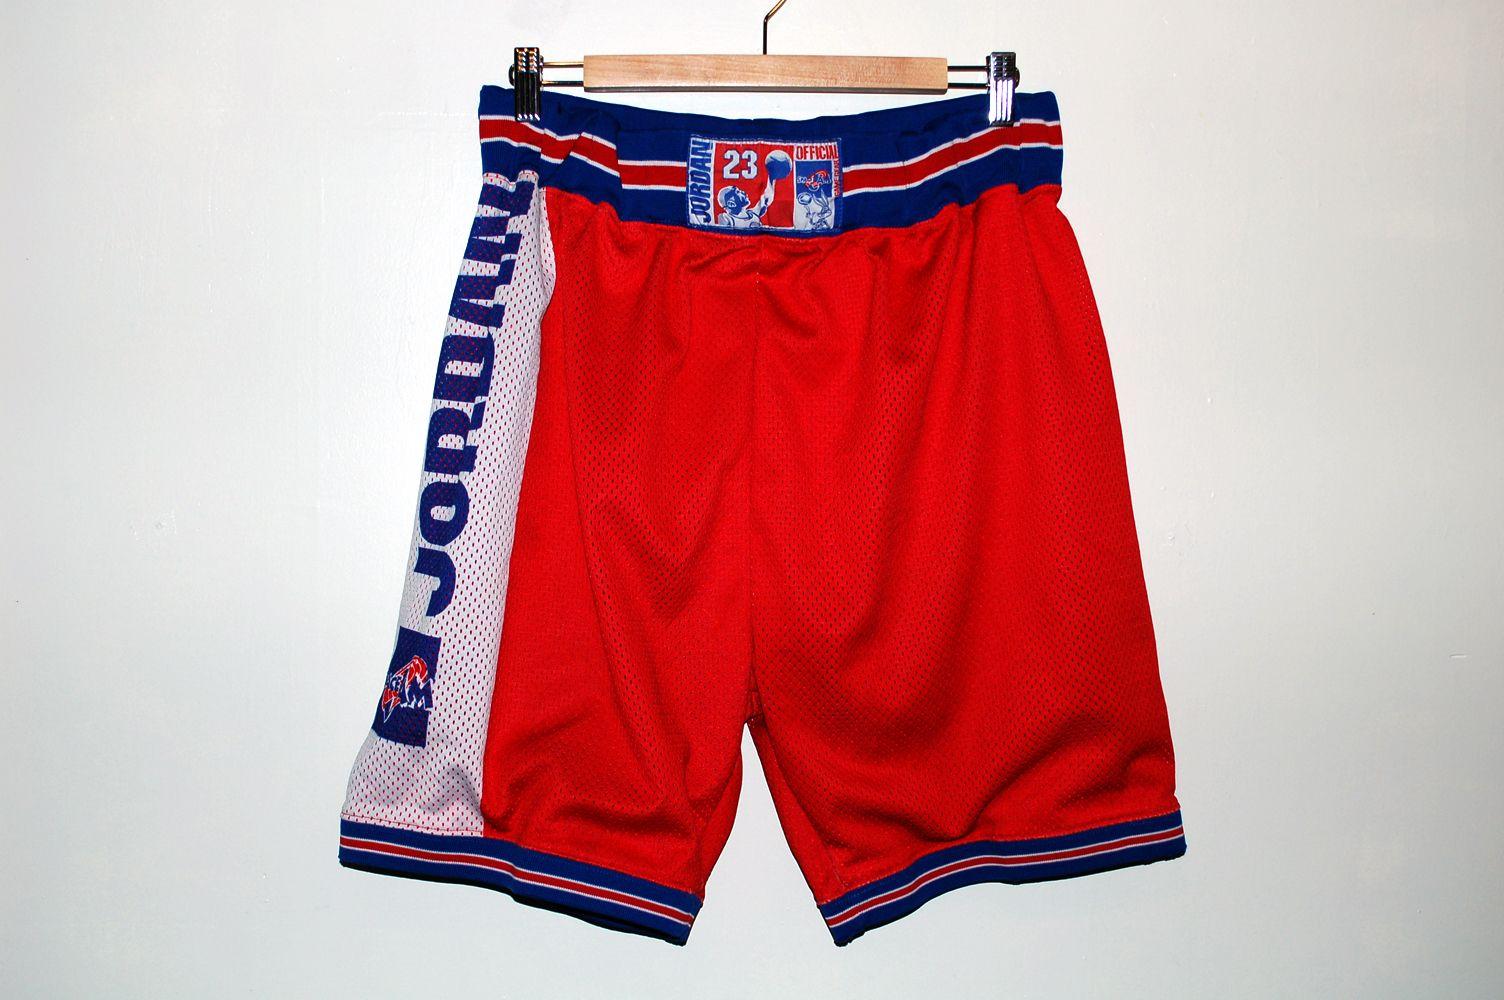 90s Space Jam x Jordan Basketball shorts